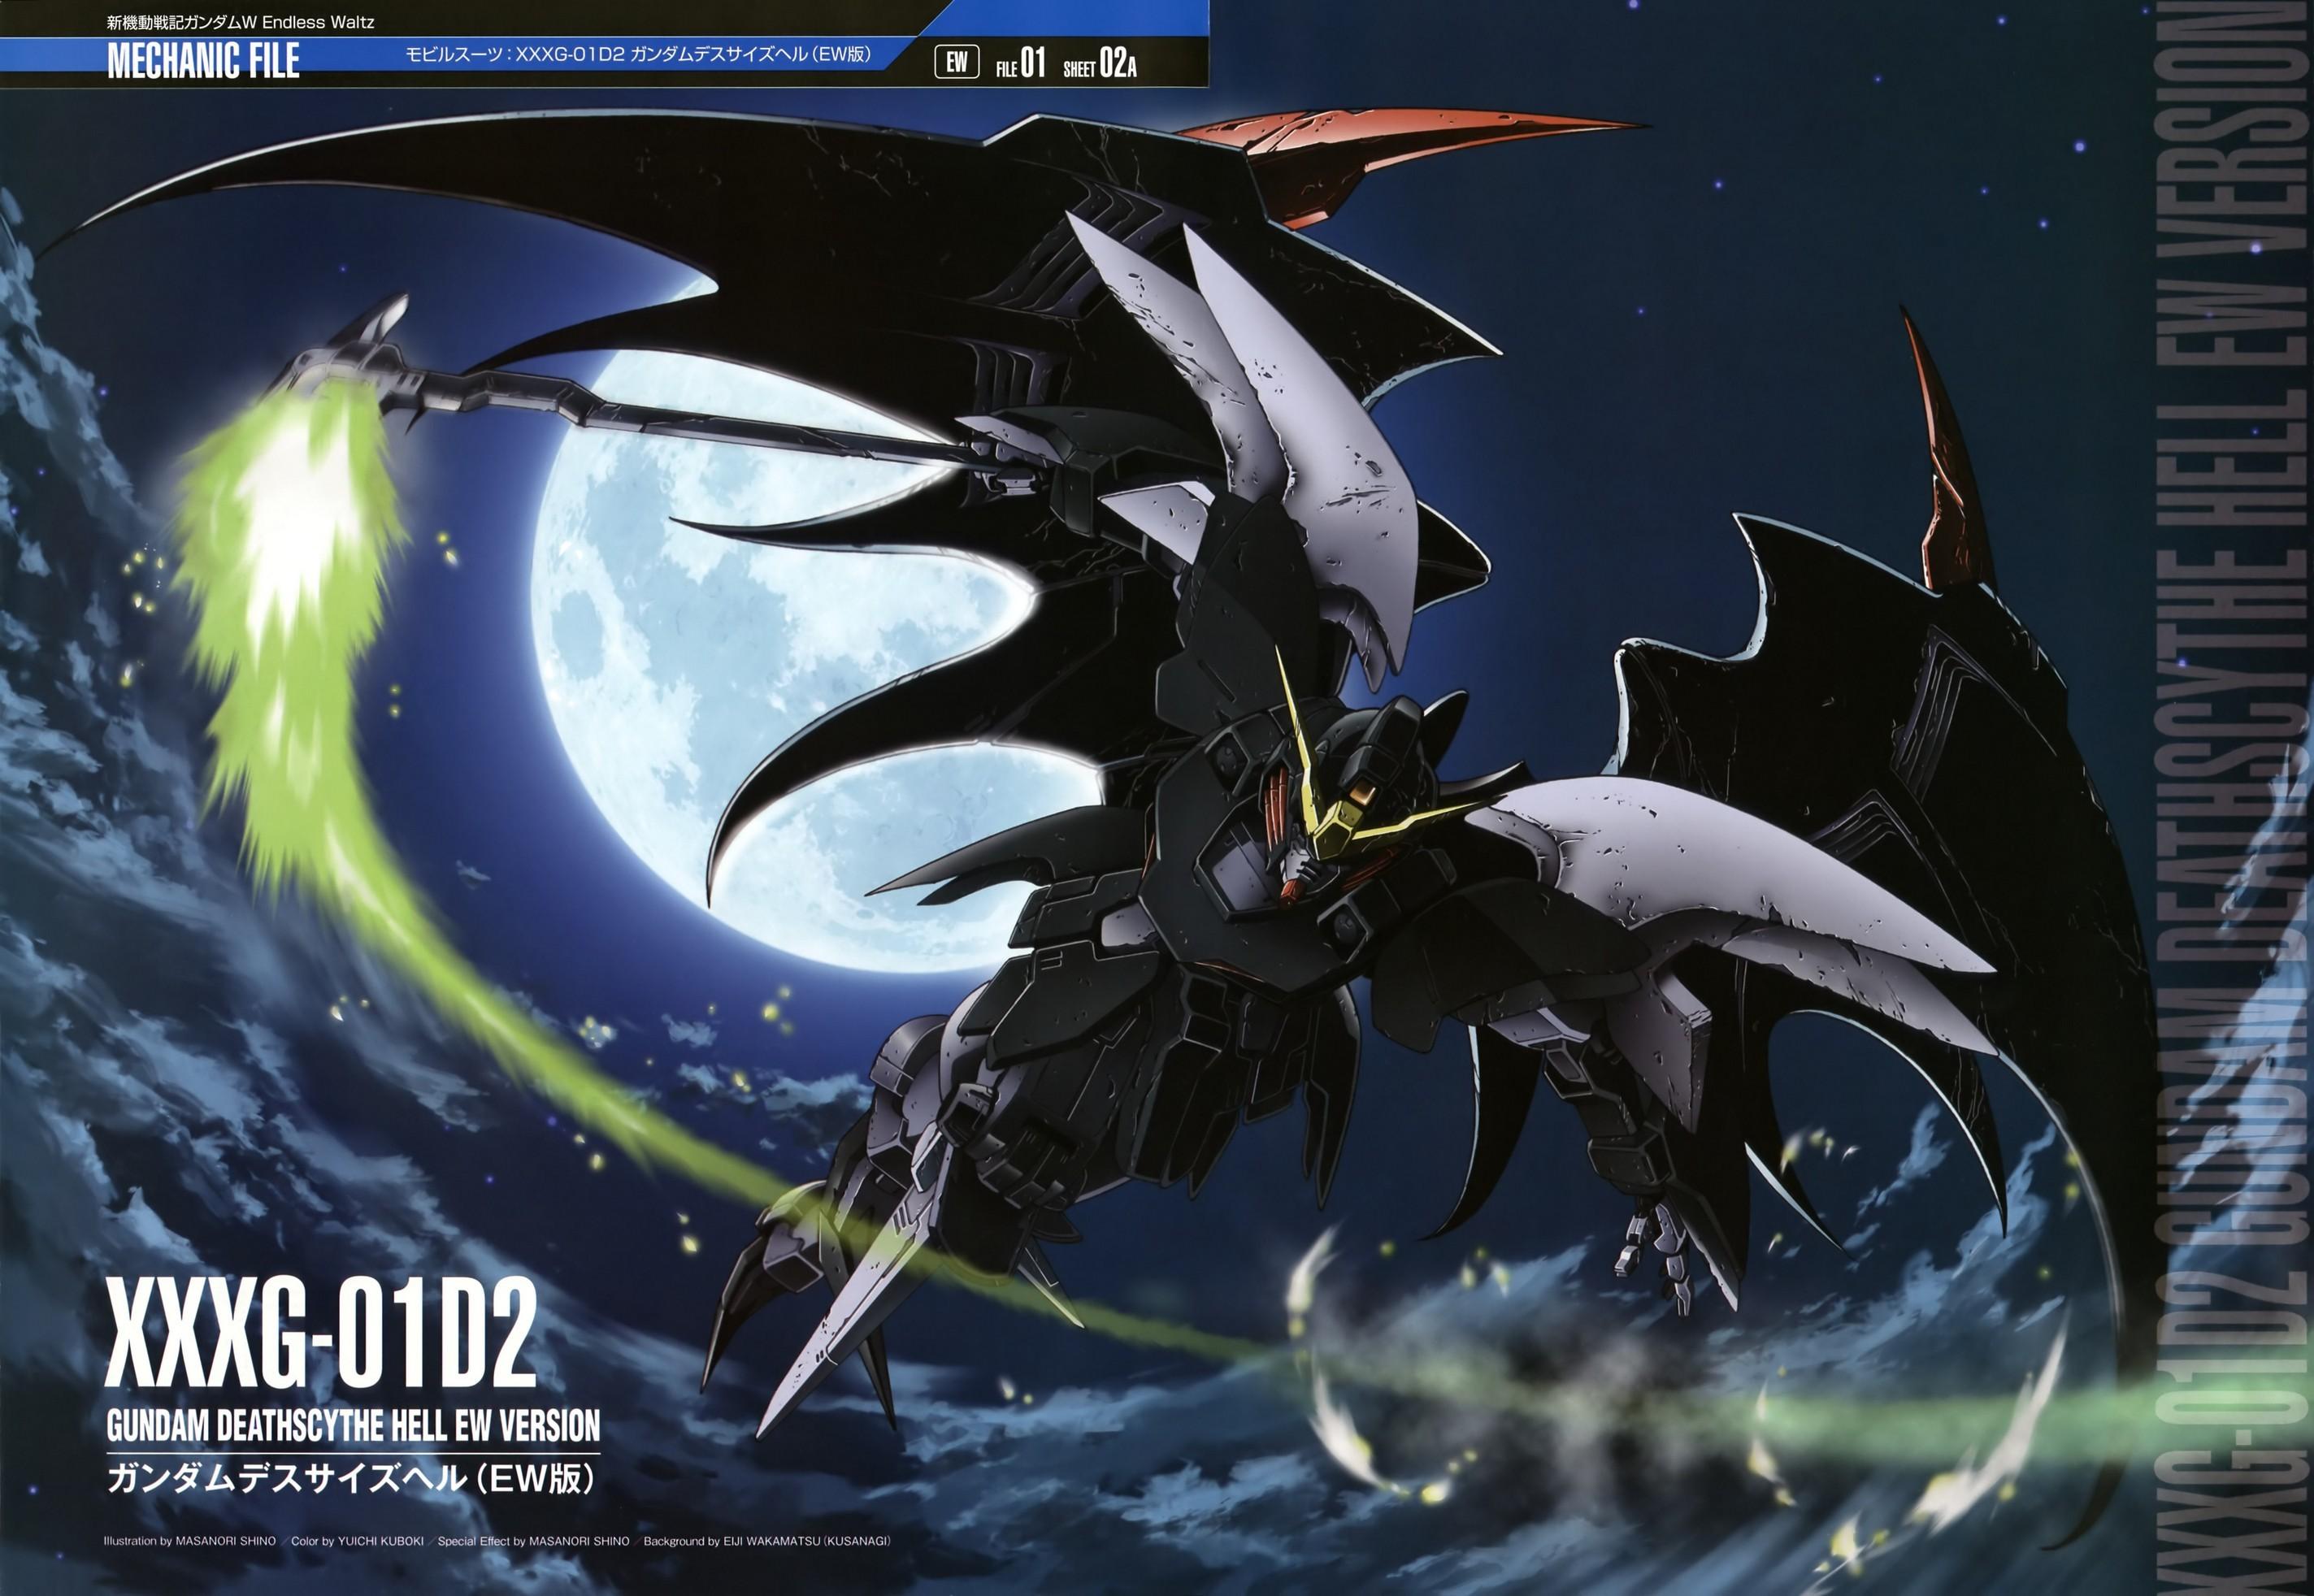 Gundam Wing Deathscythe Wallpaper 74 images 2847x1964